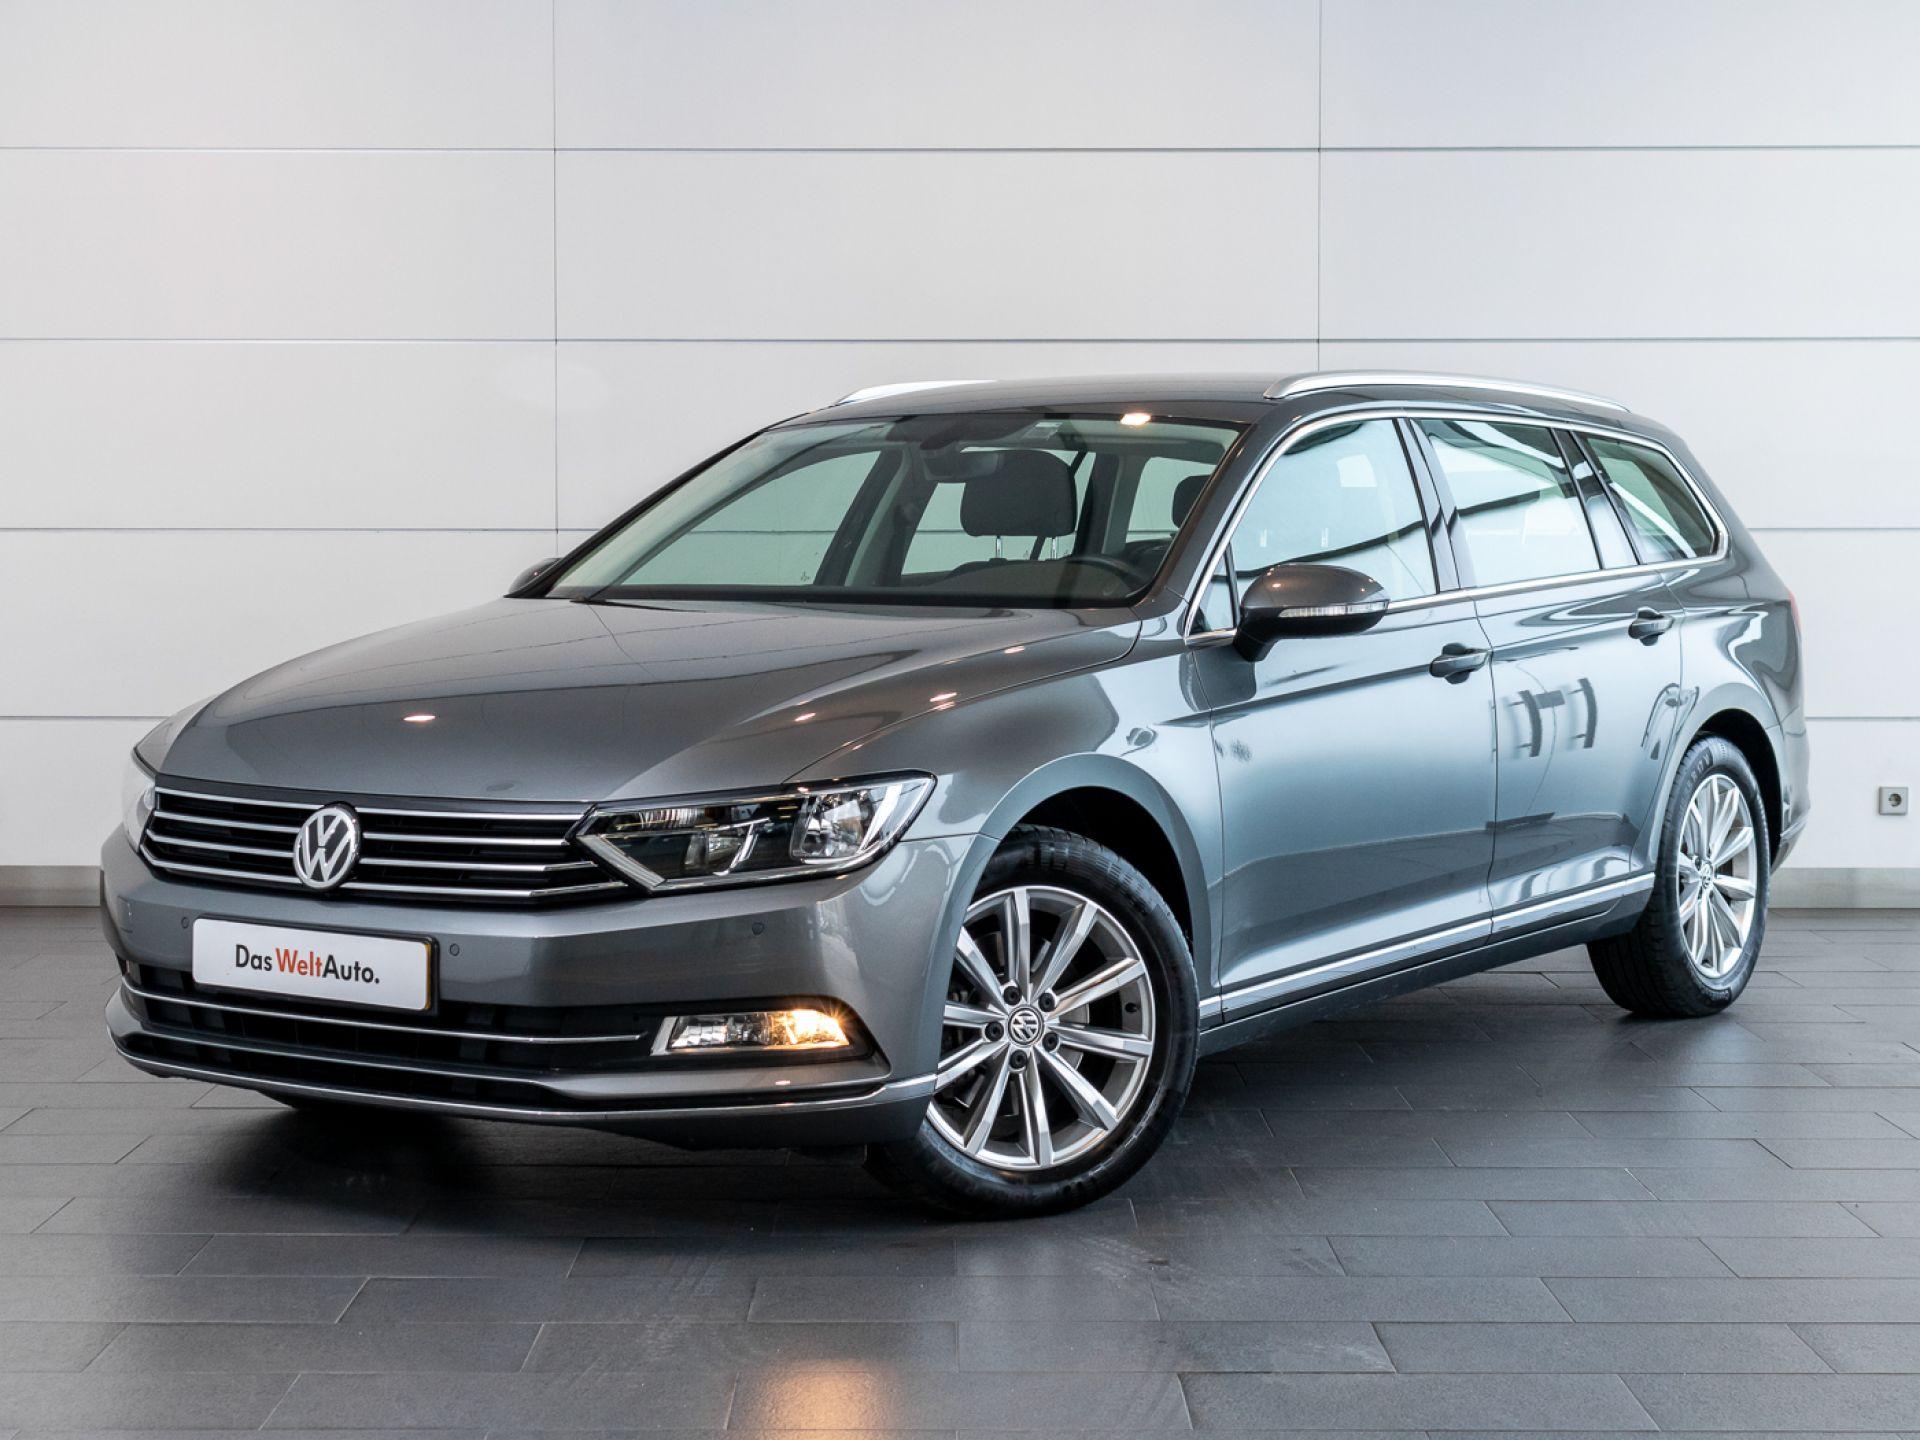 Volkswagen Passat 1.6 TDI HIGHLINE VARIANT usada Setúbal